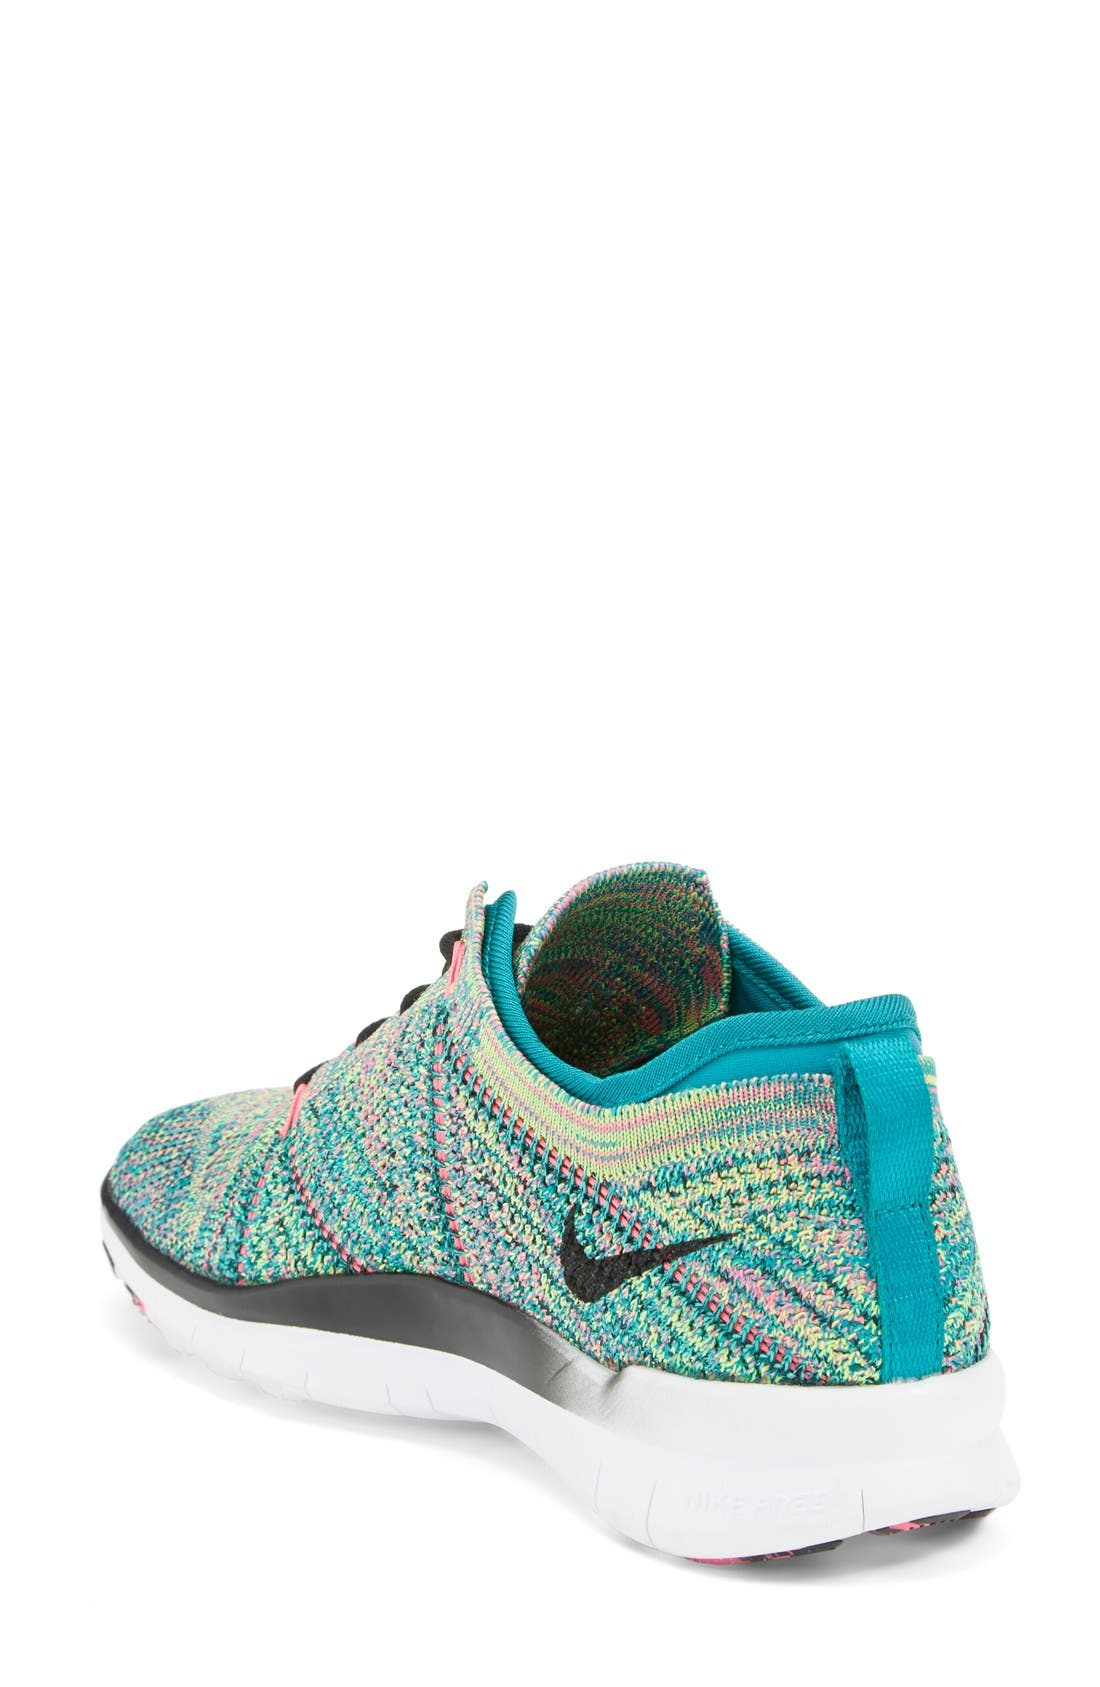 ,                             'Free Flyknit 5.0 TR' Training Shoe,                             Alternate thumbnail 17, color,                             300